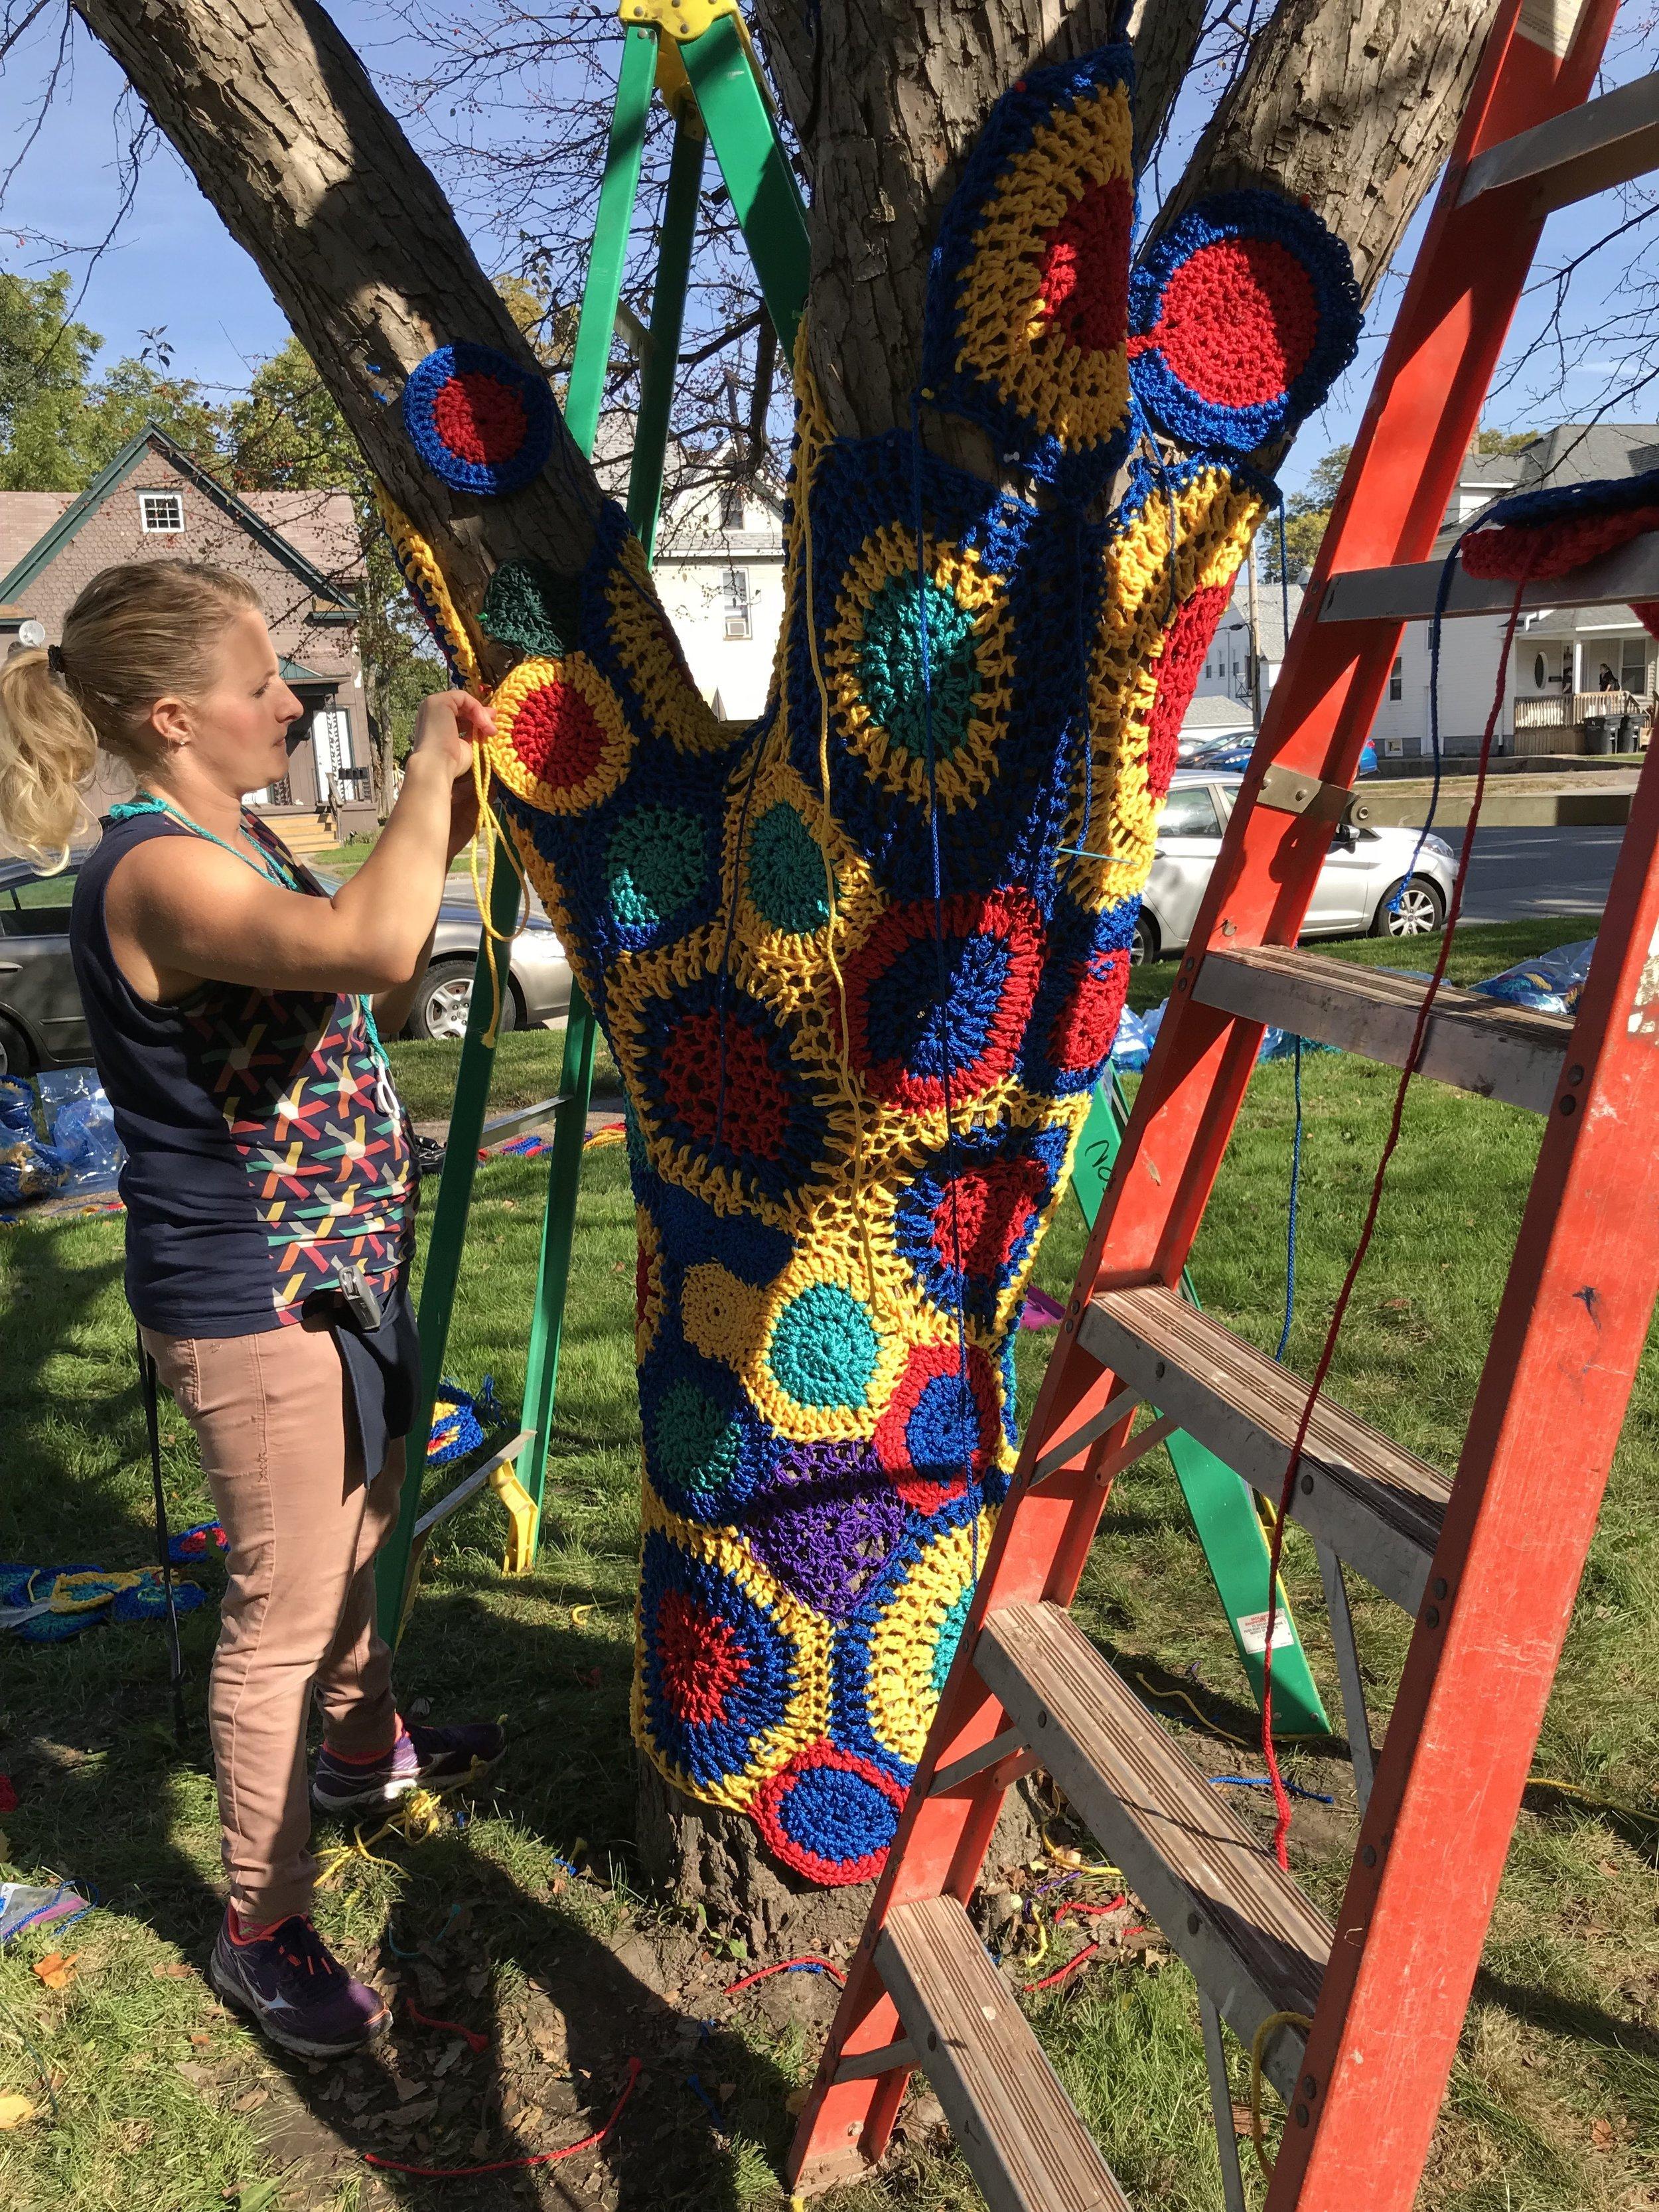 Installation at Longfellow Elementary School (photo courtesy of Carol Hummel)